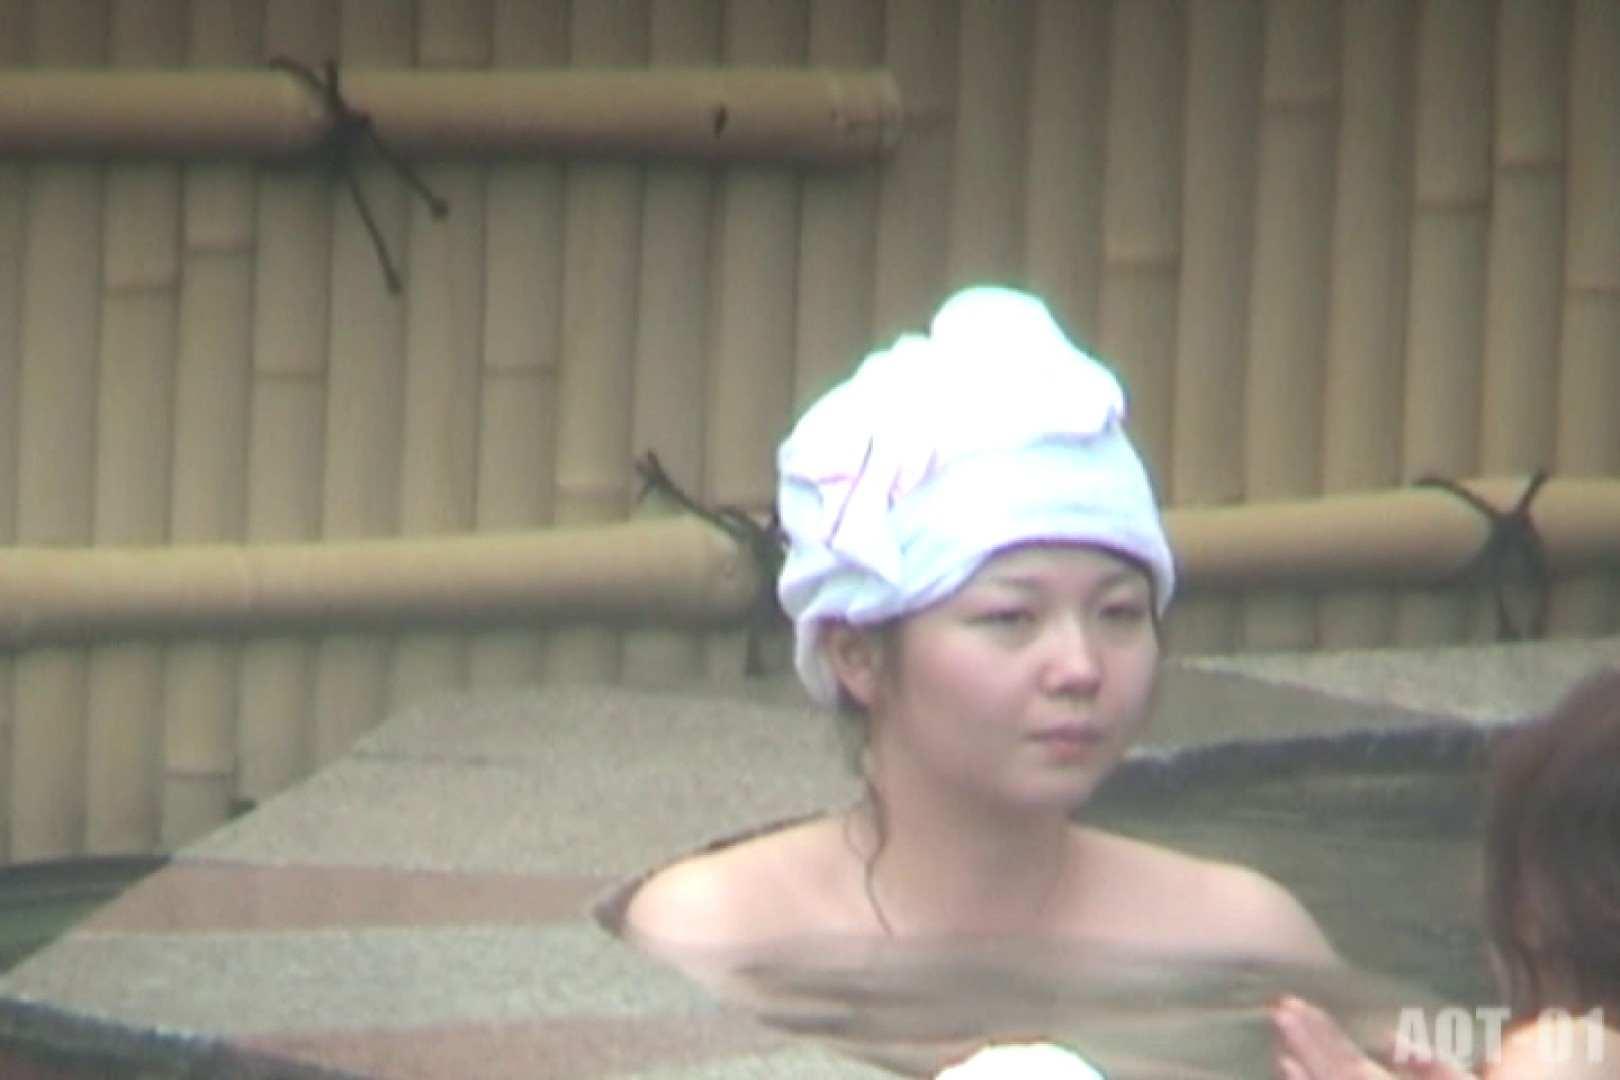 Aquaな露天風呂Vol.715 OLセックス 覗きおまんこ画像 77画像 32